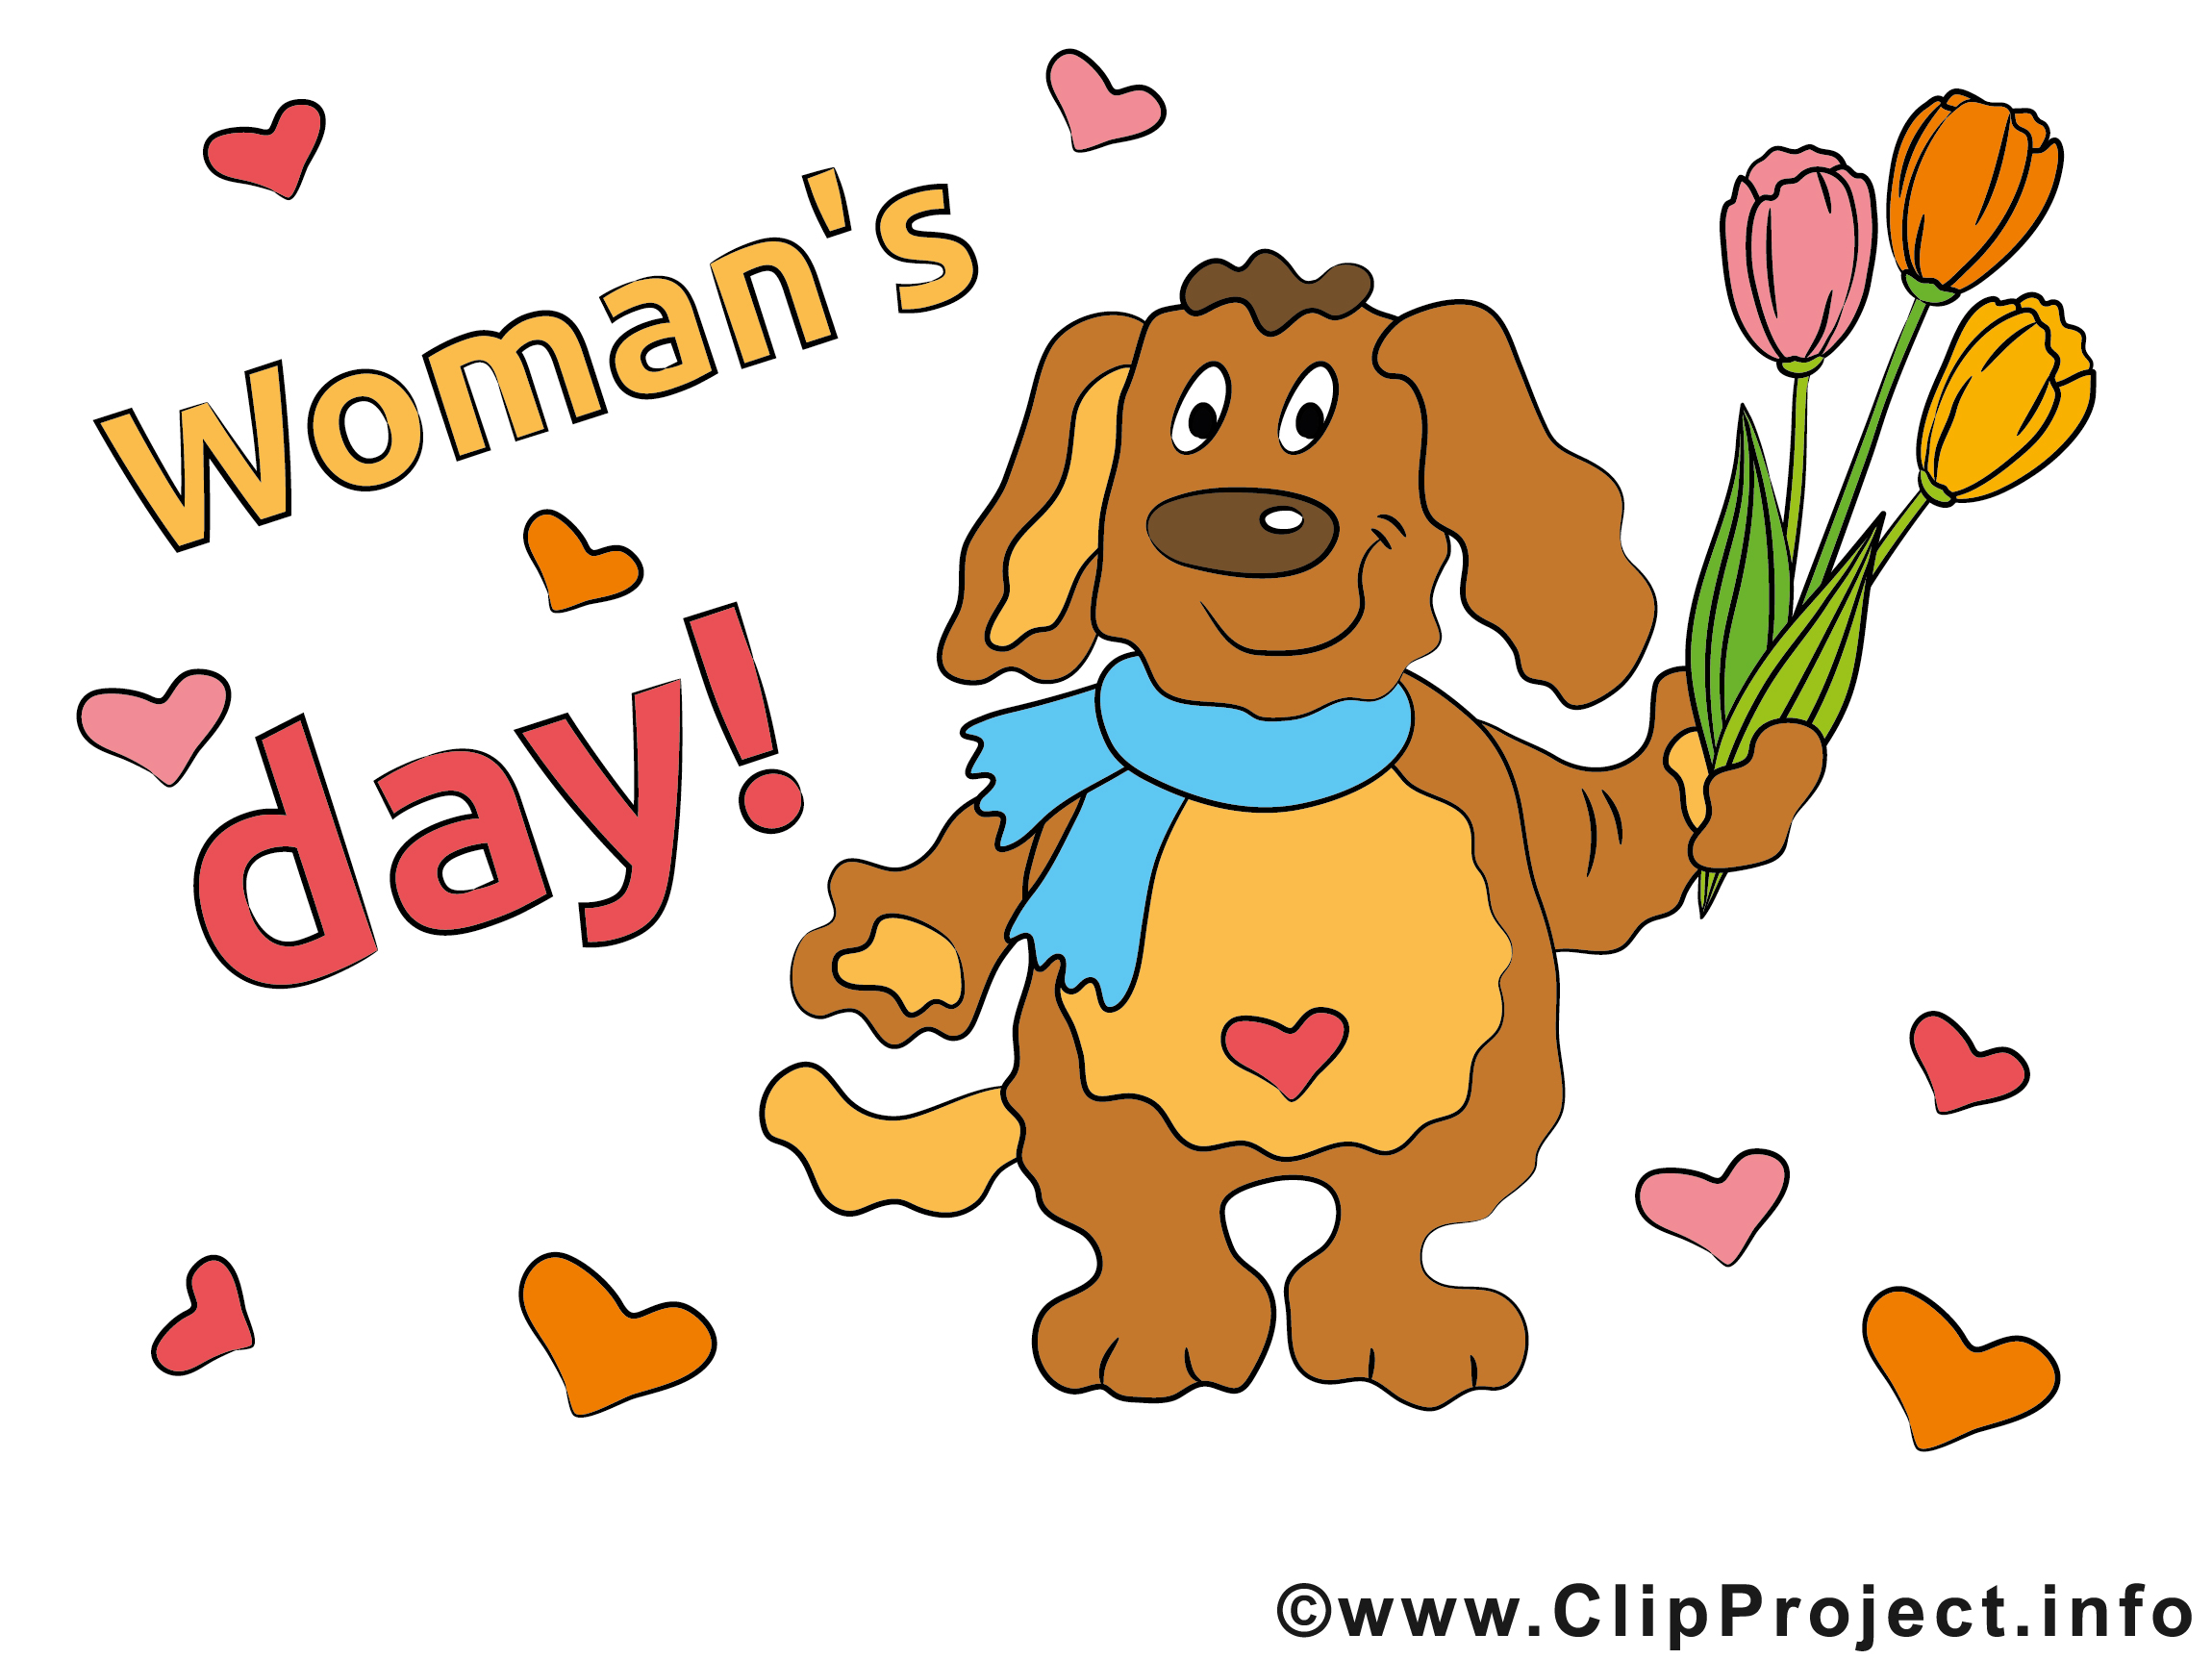 Frauen Tag 8 März 2015